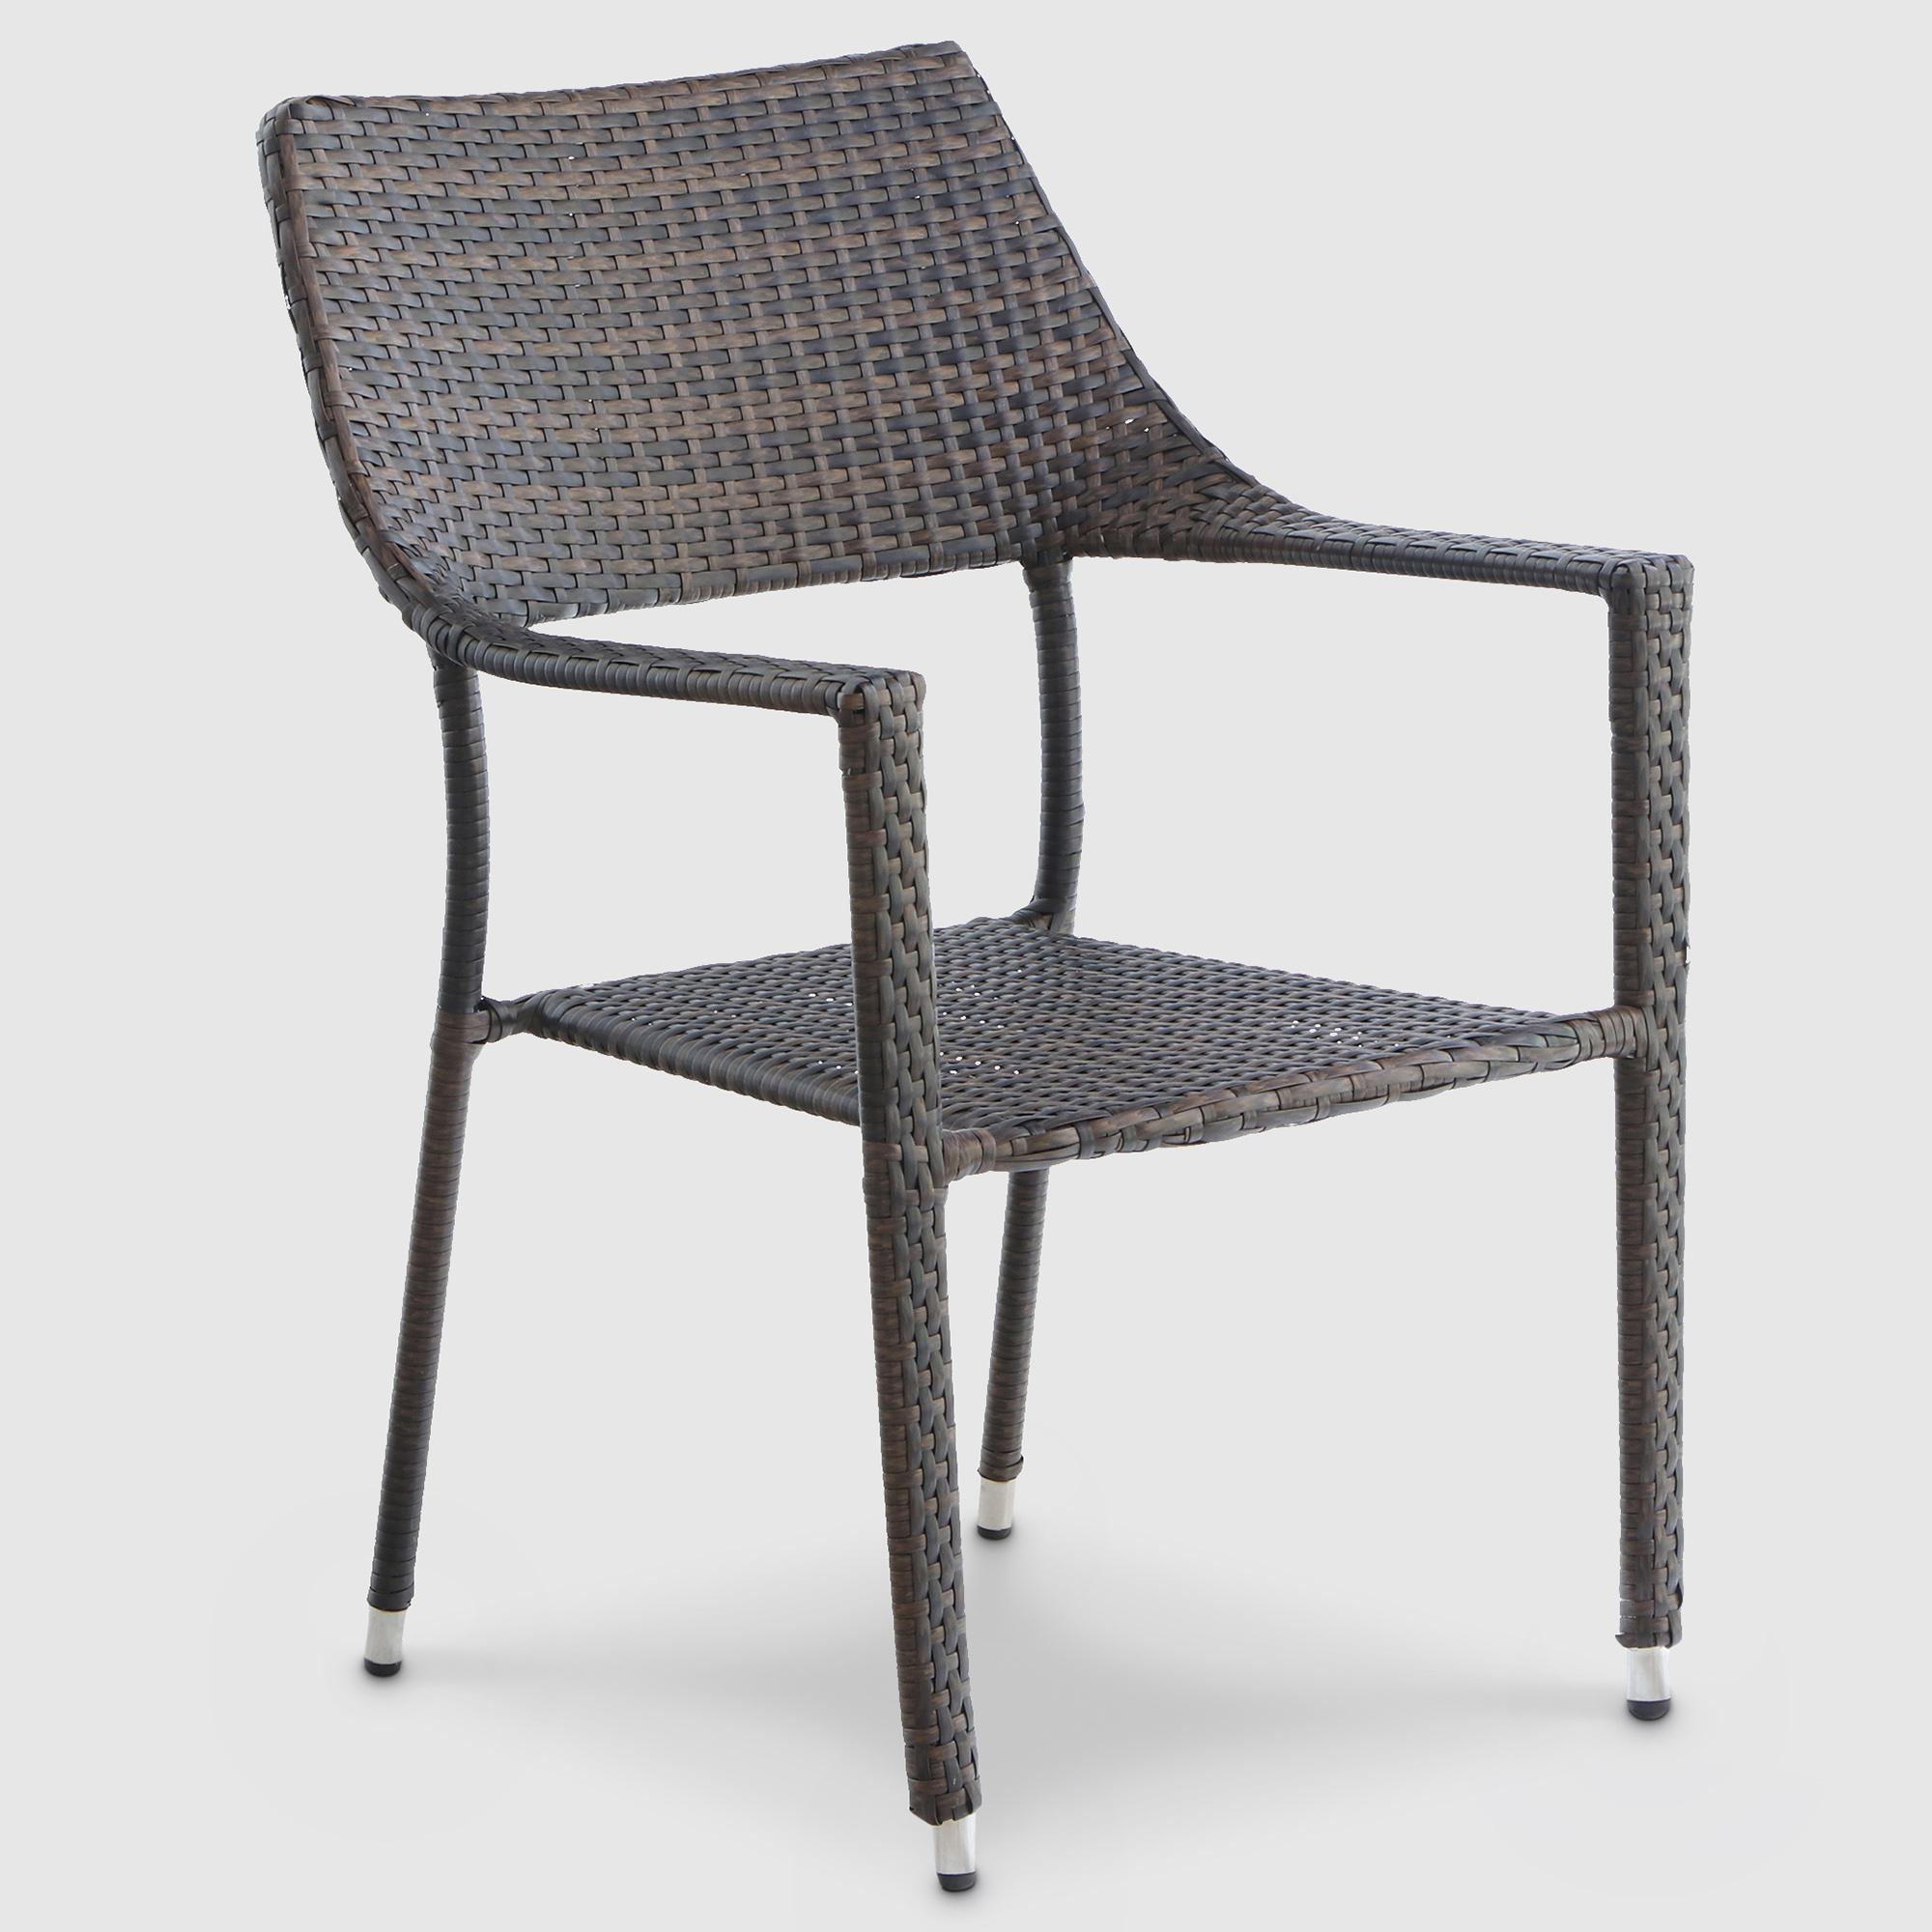 Фото - Кресло Mavi rattan 57x59x87cm темно-коричневое рубашка mavi 021235 620